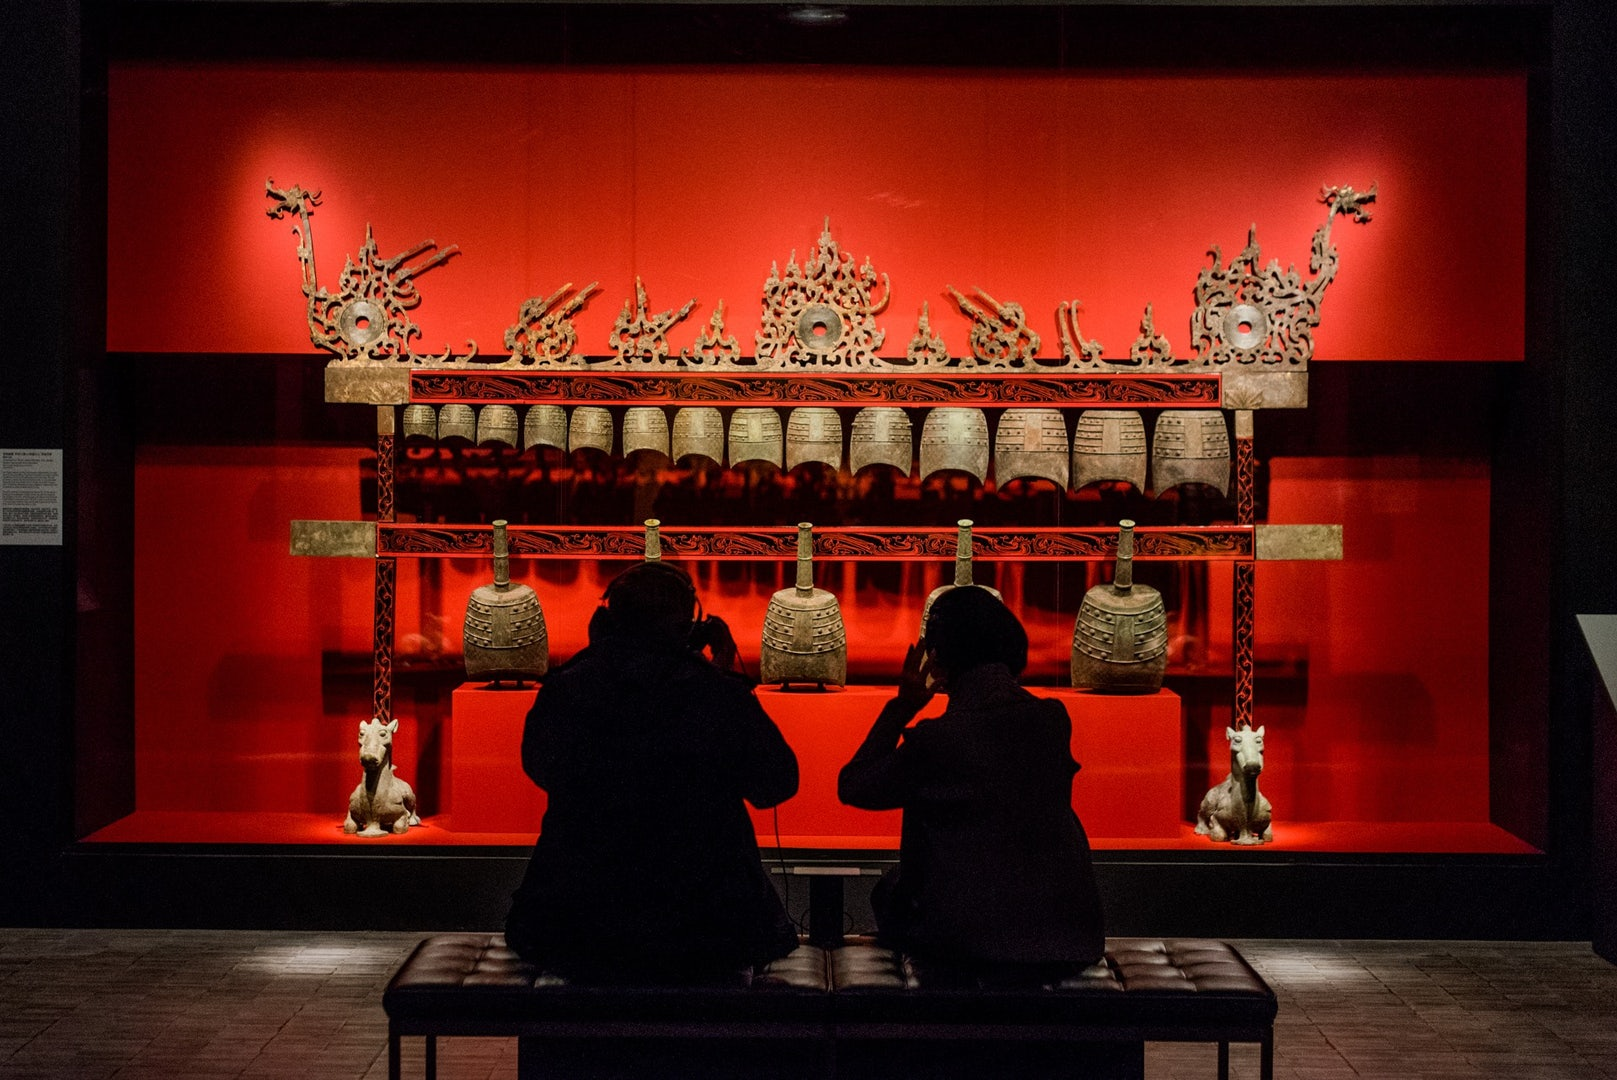 San Francisco - Asian Art Museum